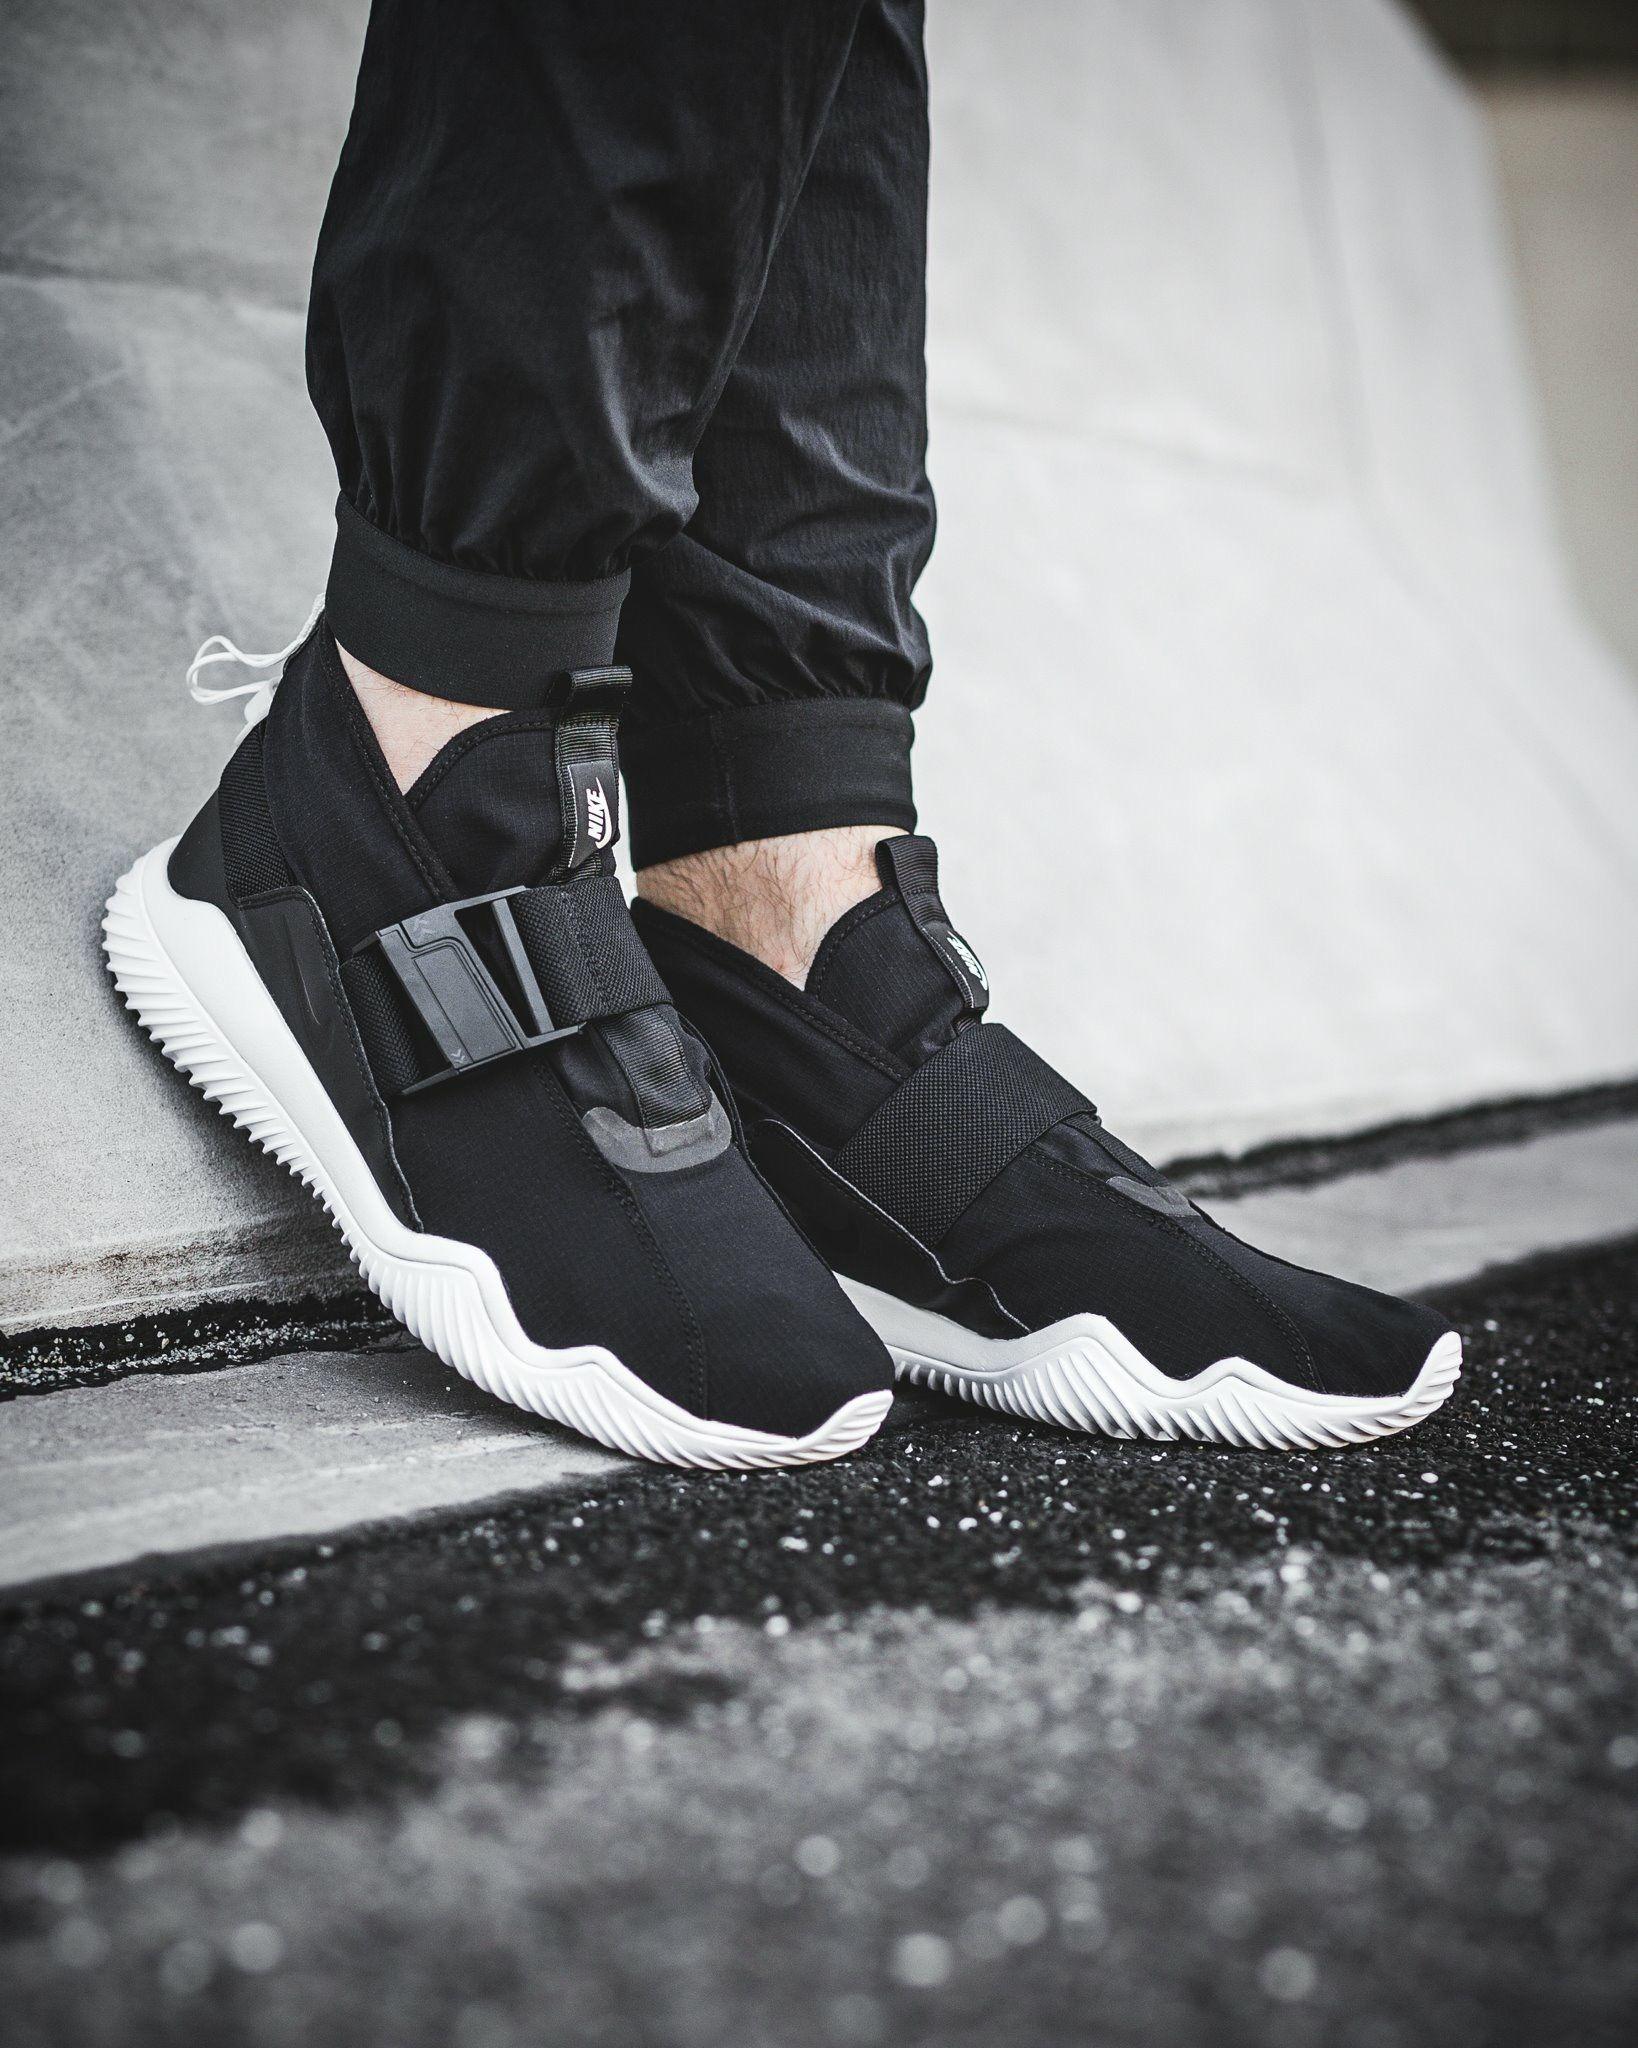 competitive price 866e6 7d72d Nike Komyuter   KICKS   Sneakers, Sneaker boots, Nike shoes